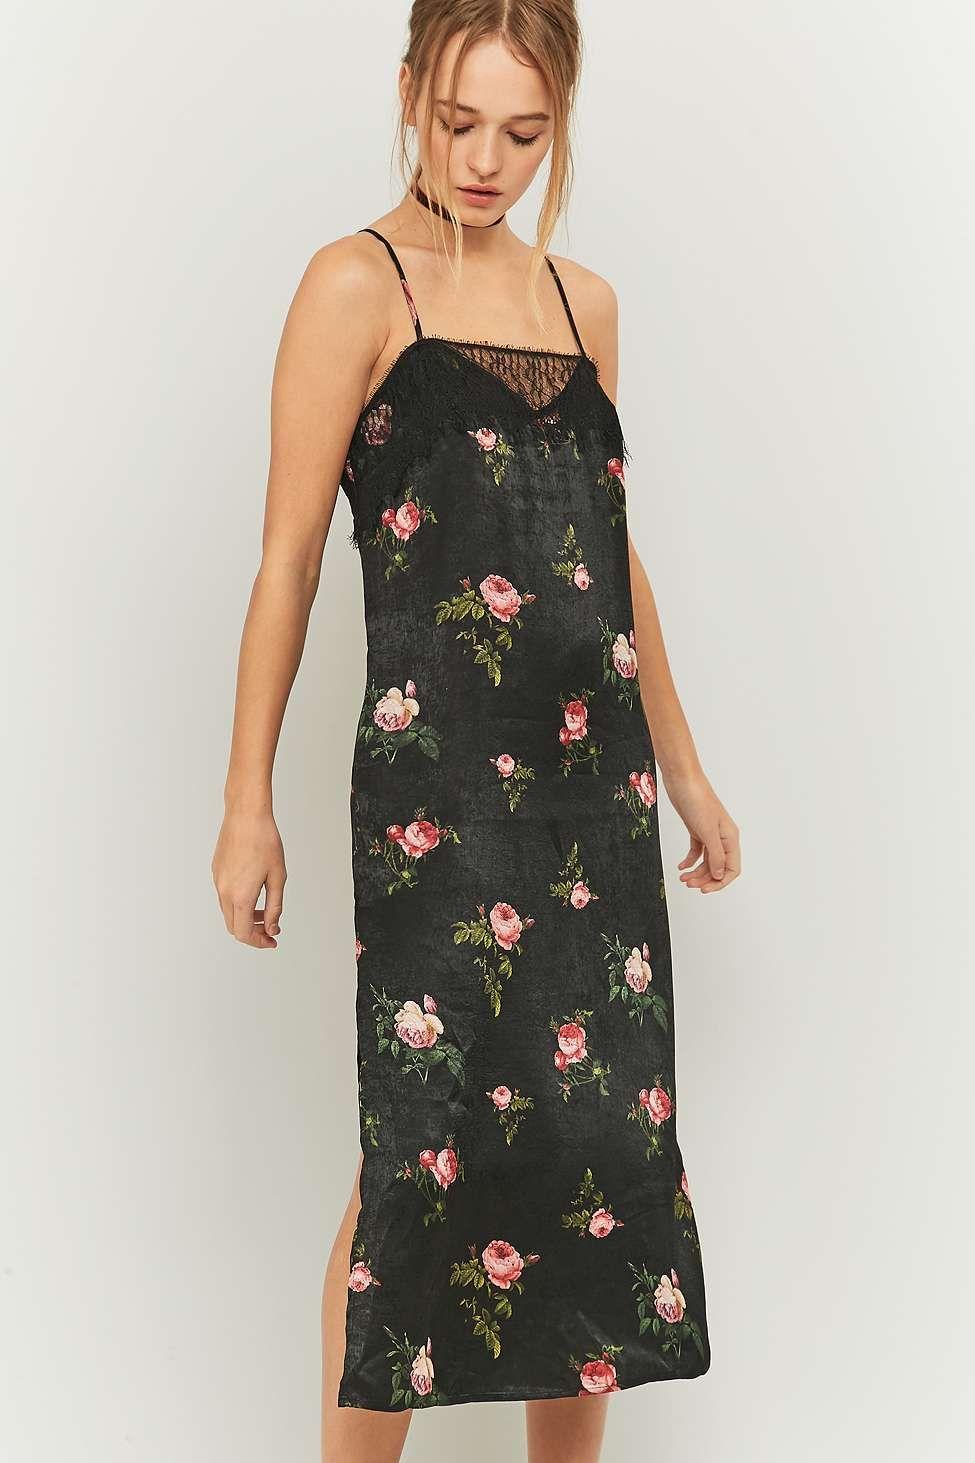 Pins And Needles Clothing Amazing Pins & Needles Floral And Lace Black Satin Midi Slip Dress  Black Inspiration Design